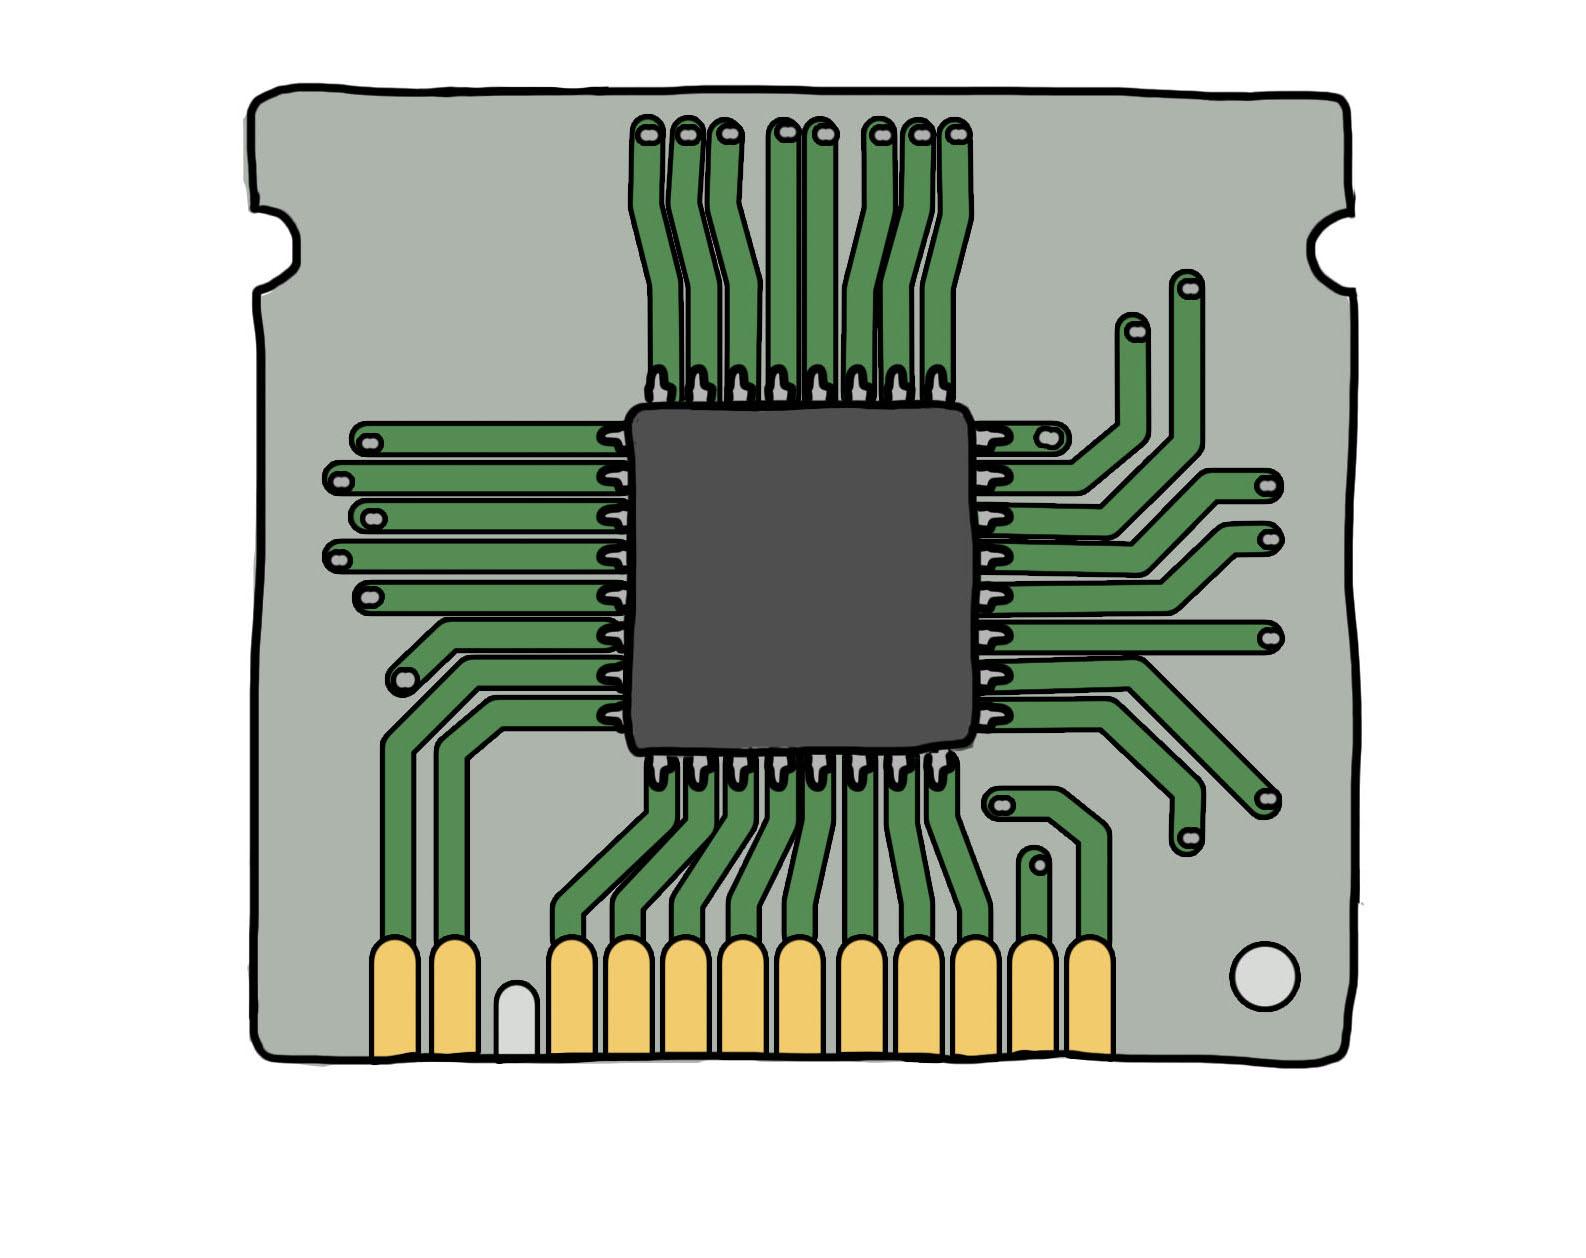 03_ComputerChiporProcessor.jpg